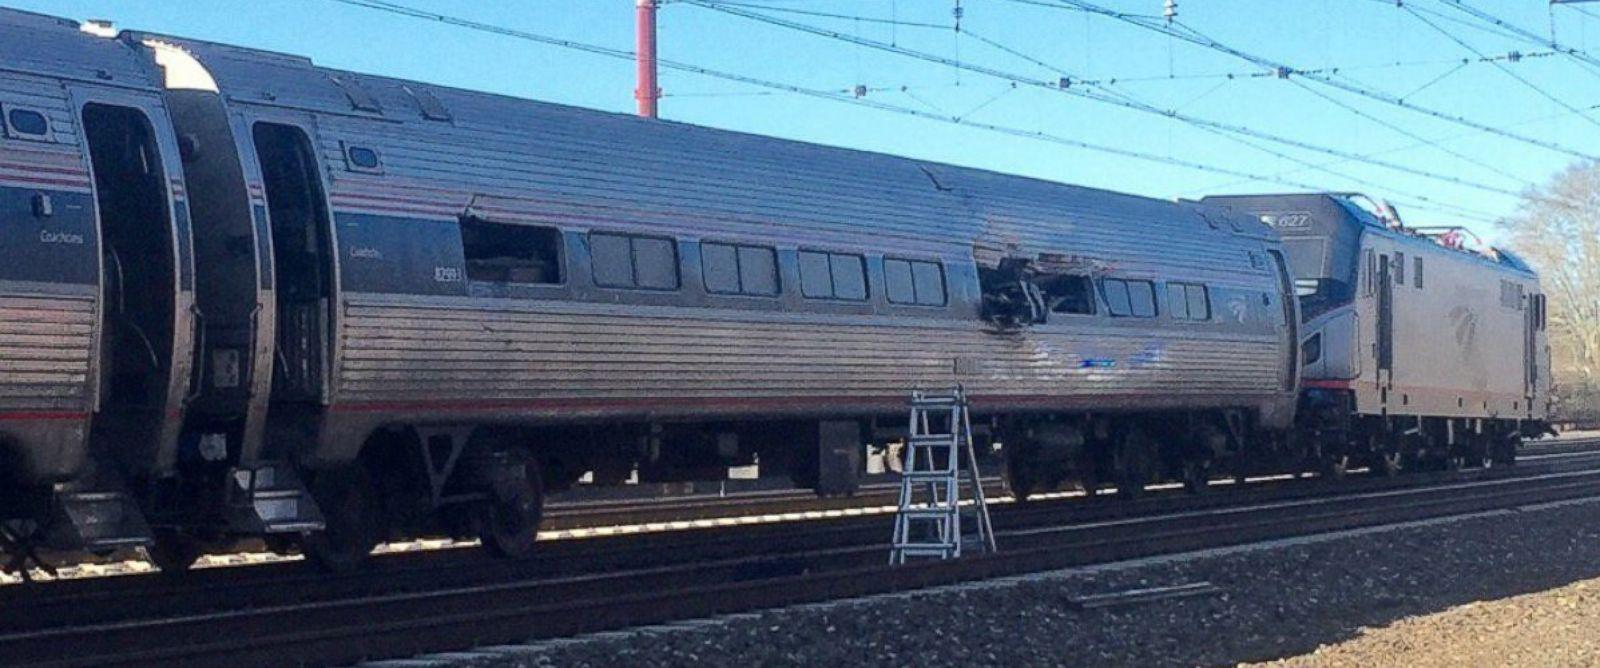 Amtrak Pictures 54